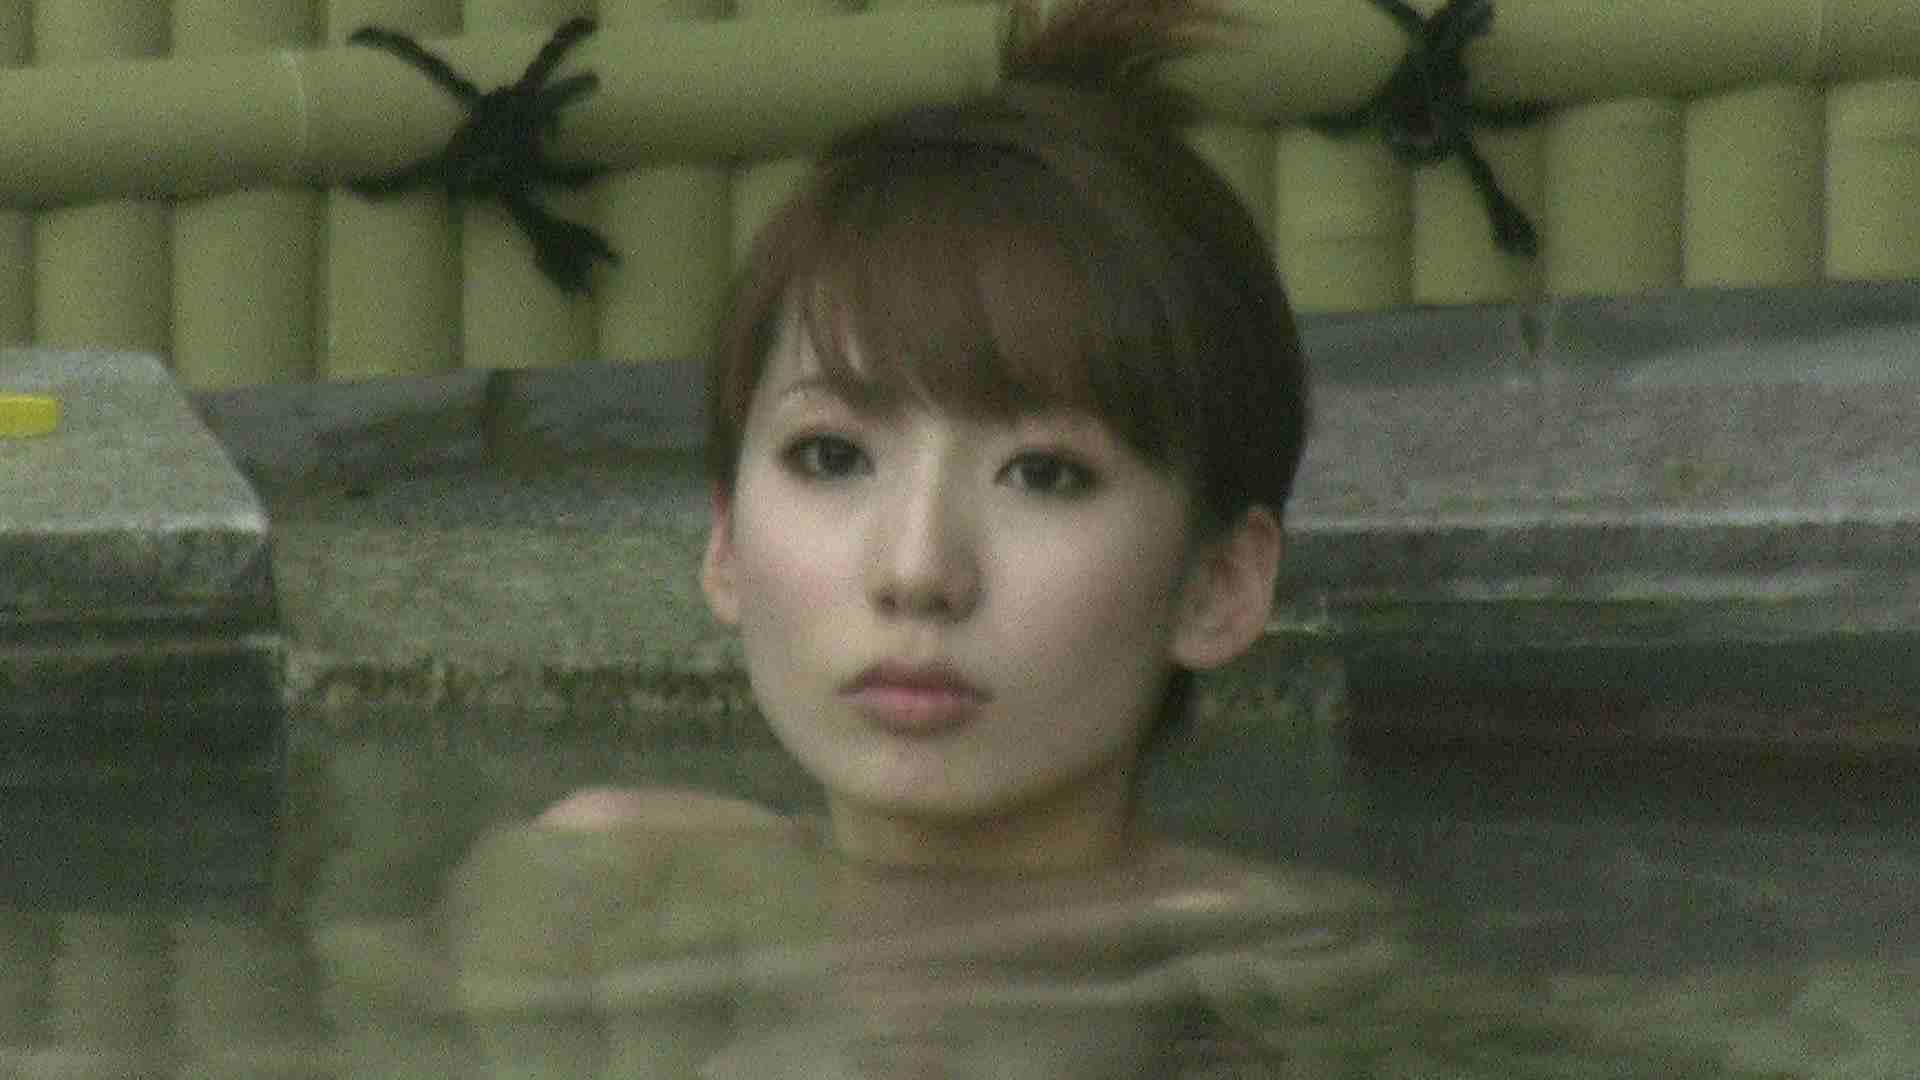 Aquaな露天風呂Vol.208 HなOL   盗撮  101pic 39